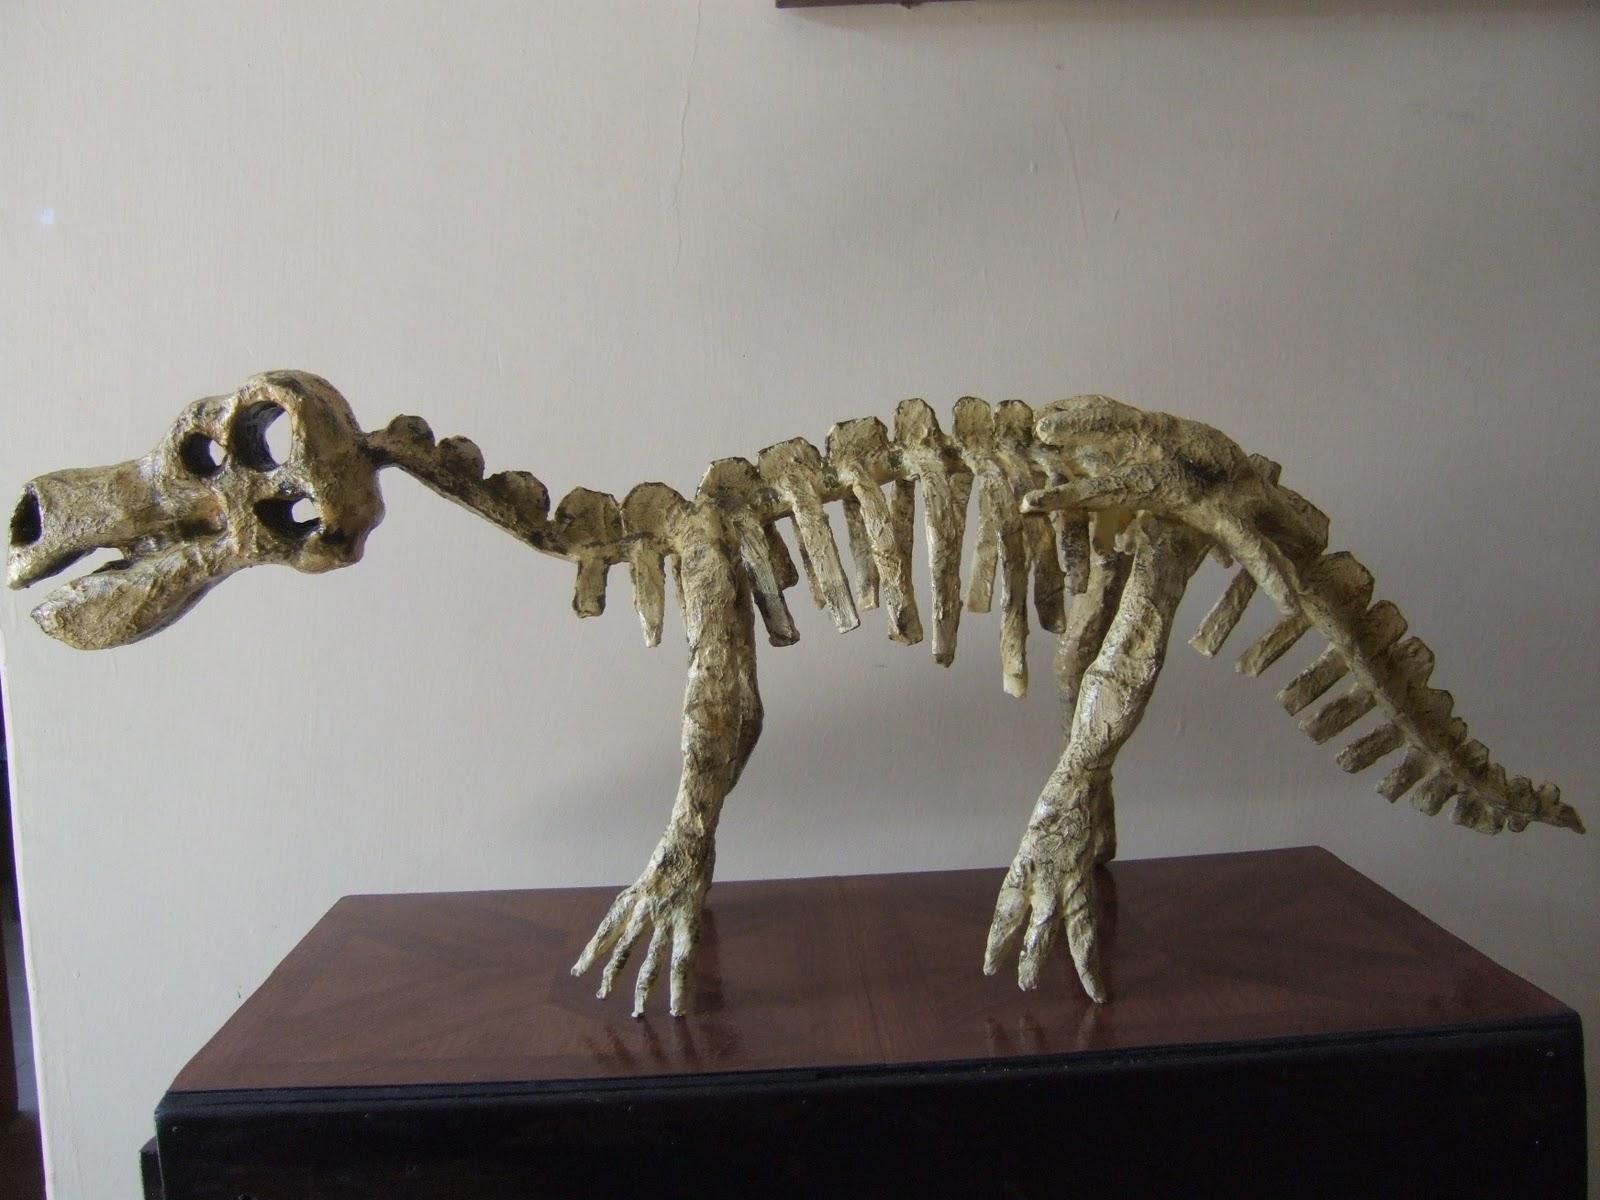 Pint-ArT y Manualidades: Esqueletos de dinosaurios